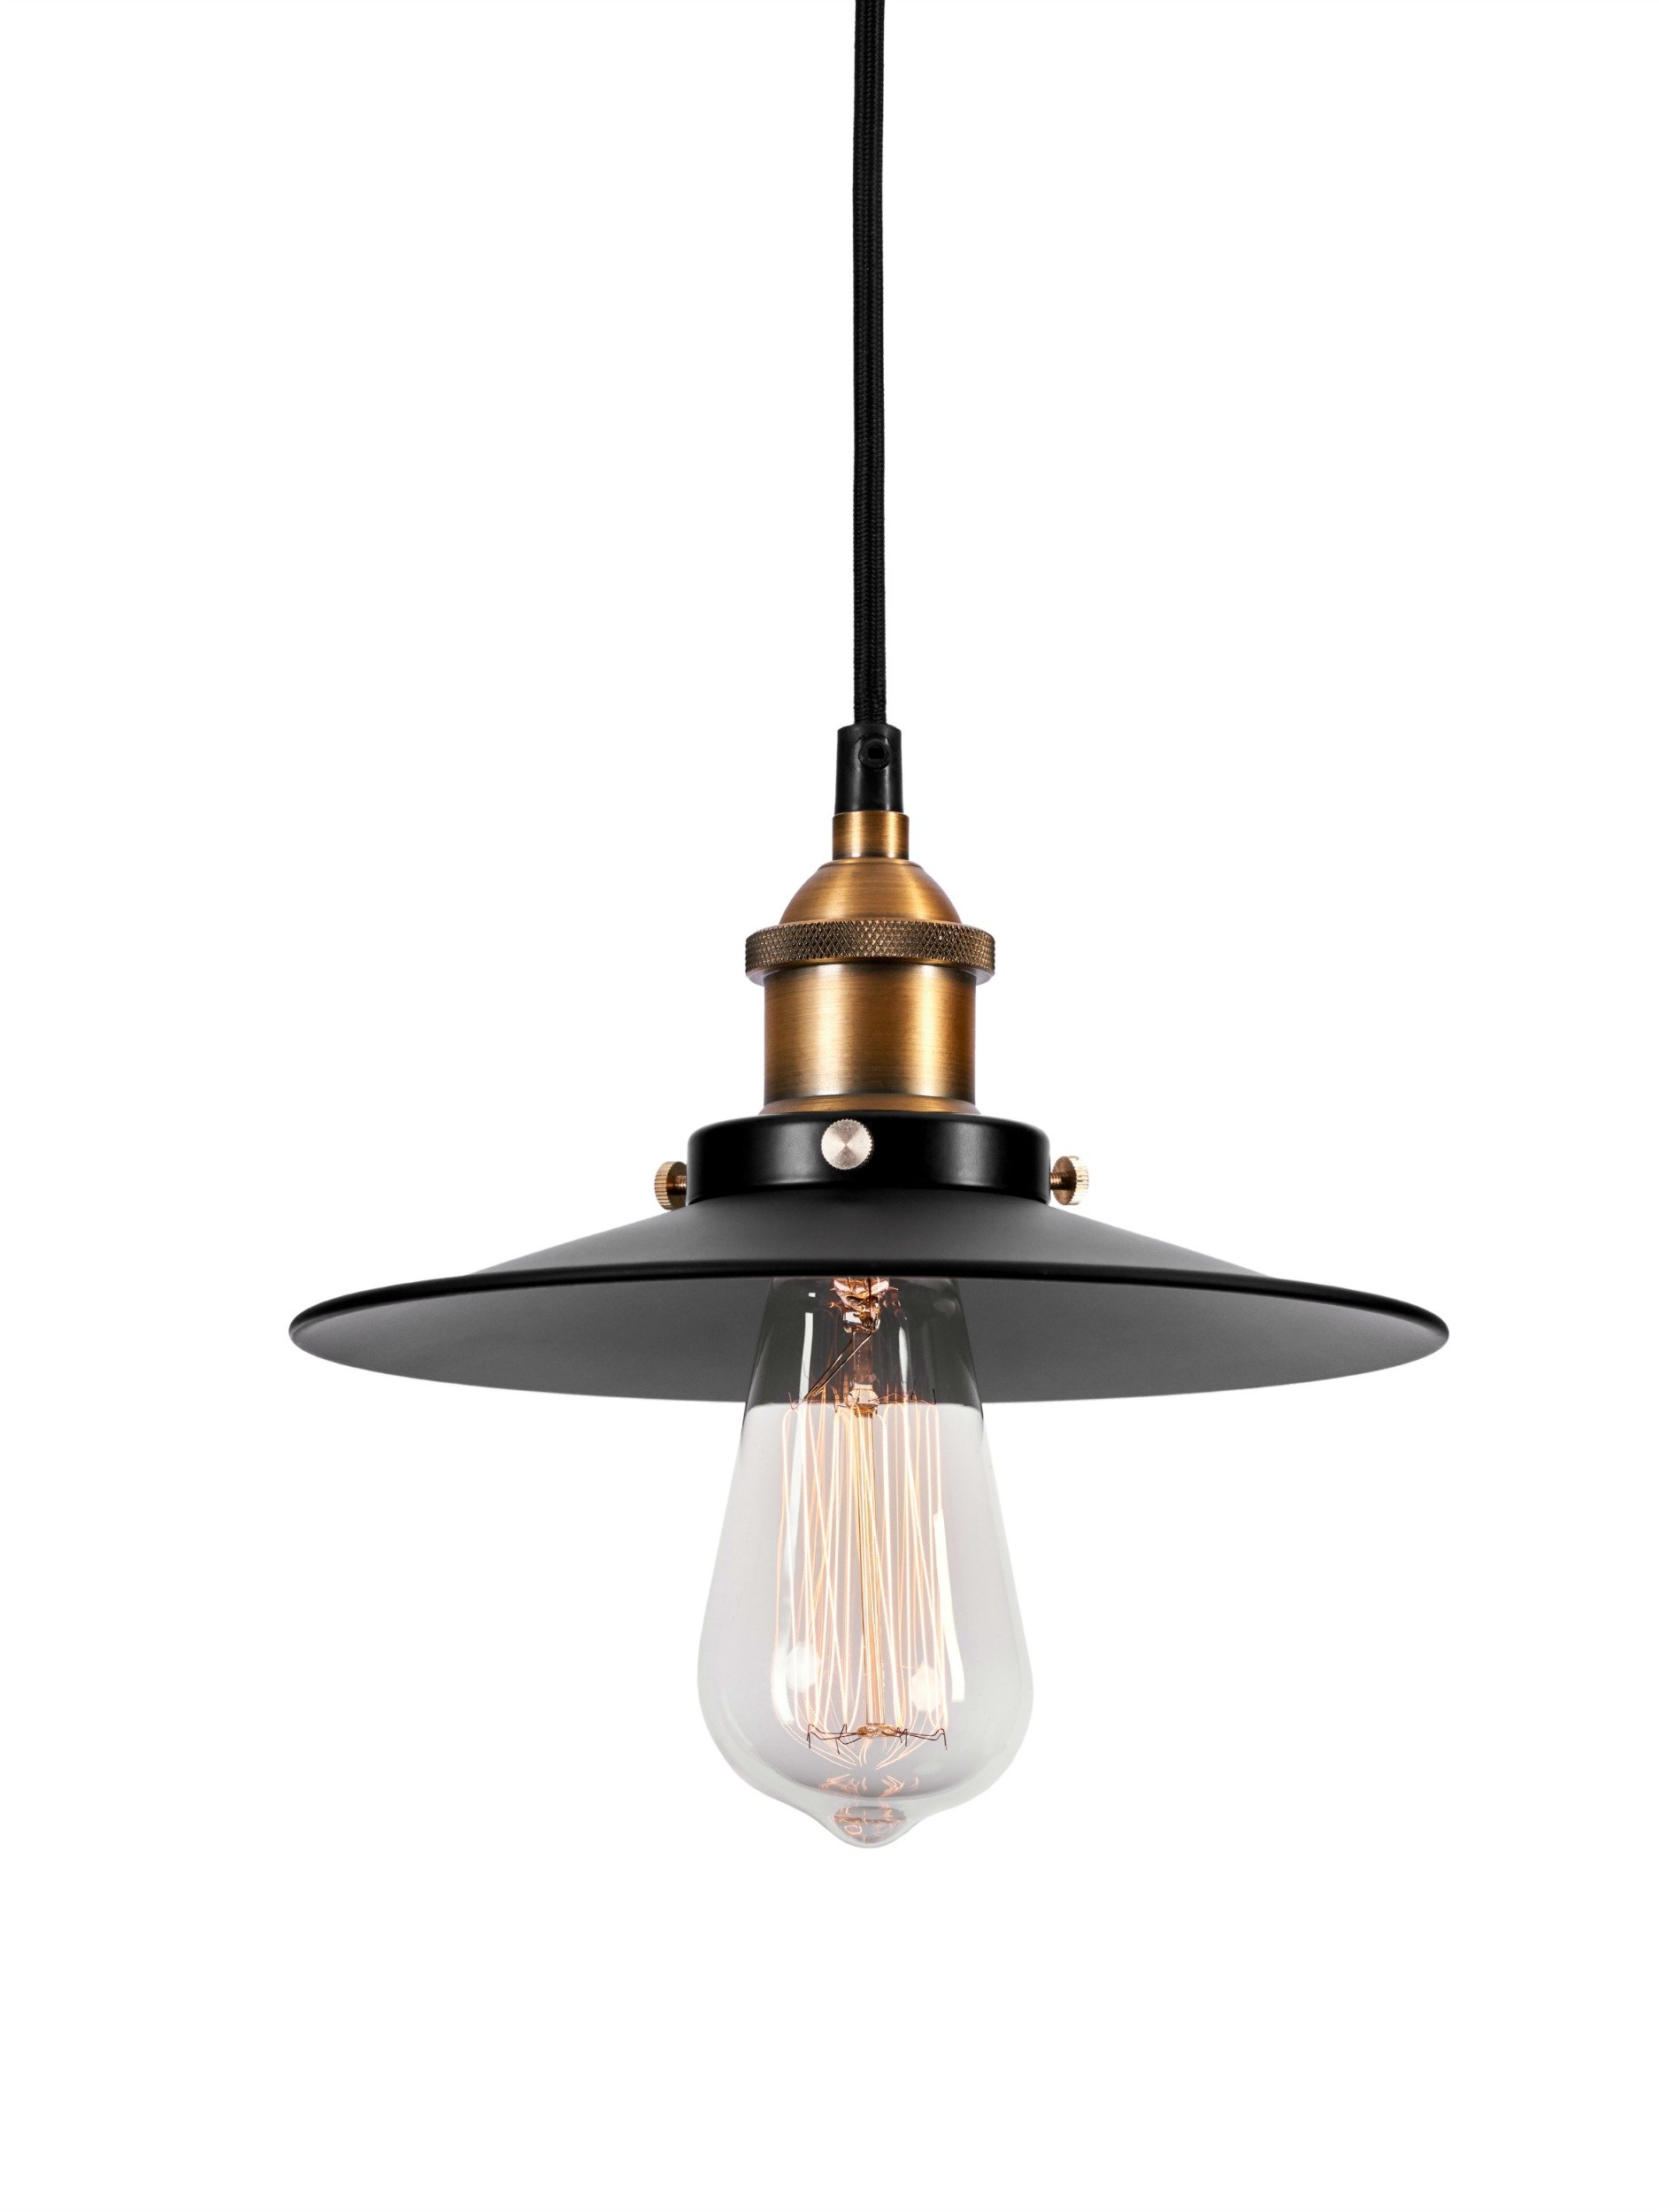 LightLady Studio - Farmhouse Lights - Pendant Light Vintage - Mini Black Pendant Light - Industrial Pendant Lighting - Vintage Barn Hanging Lamp - Fits with Modern, Industrial, Rustic, Farmhouse Style by LightLady Studio